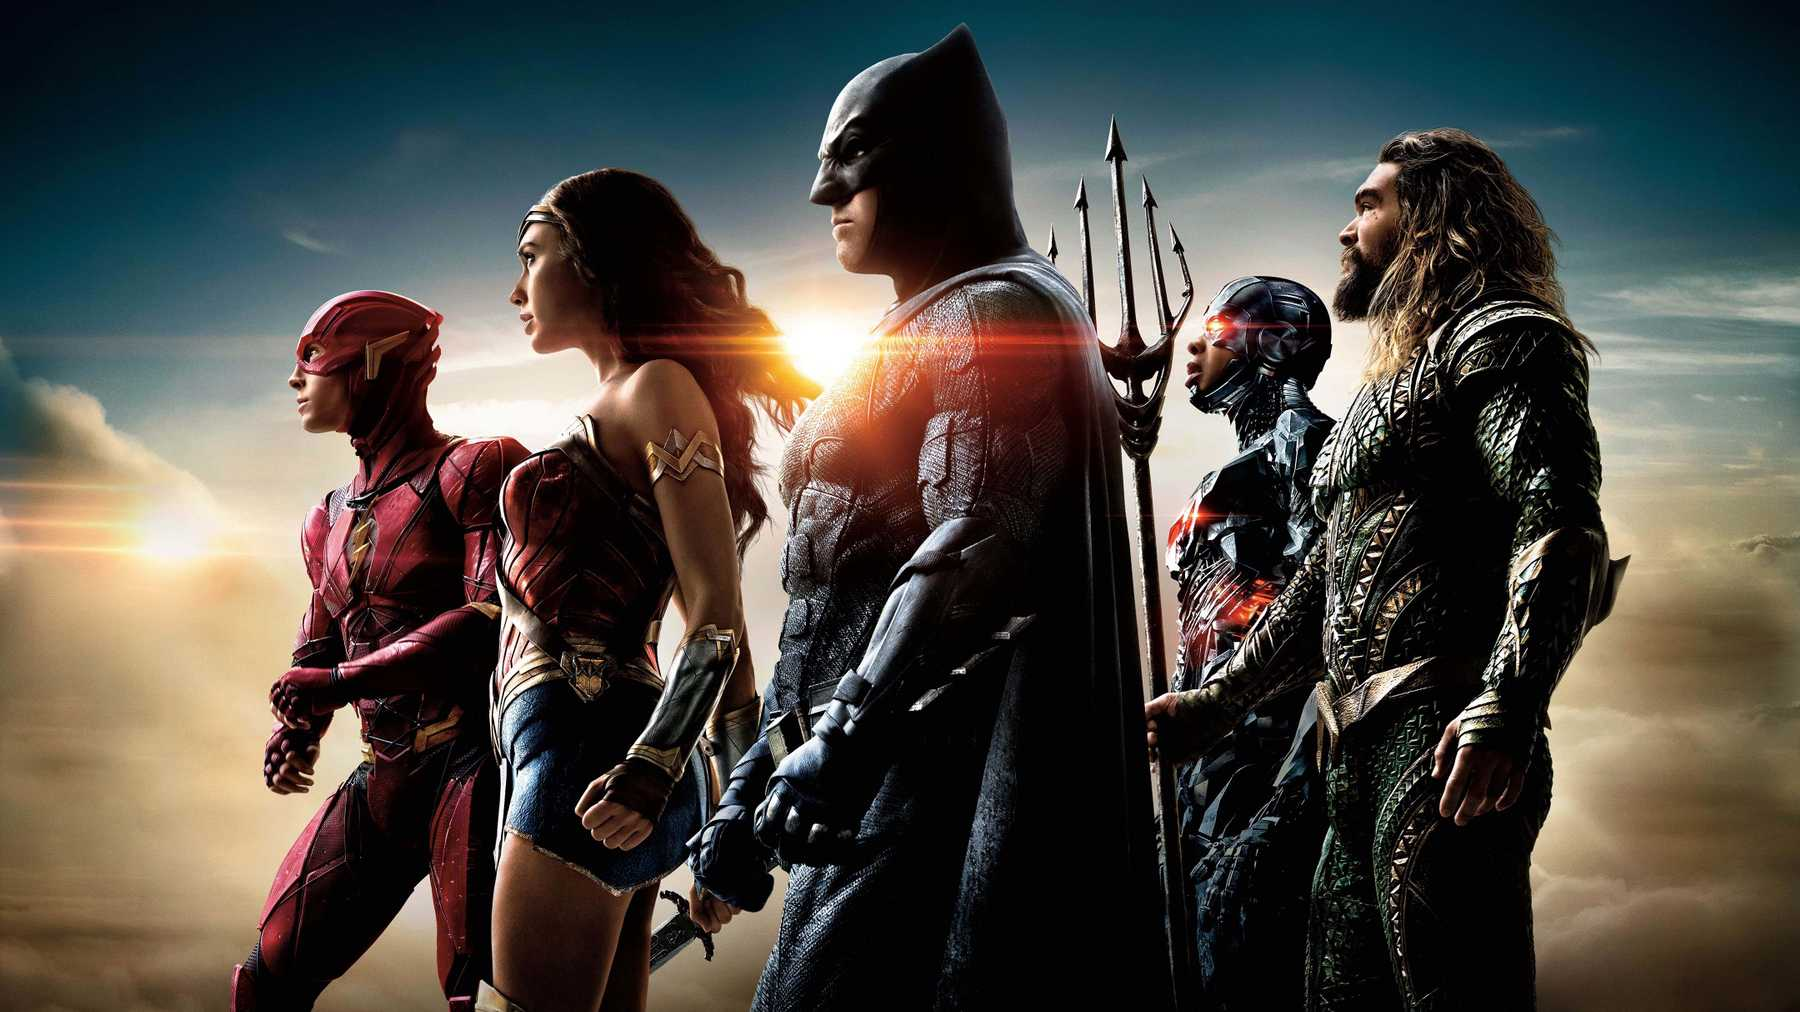 Zack Snyder's Justice League WarneMedia